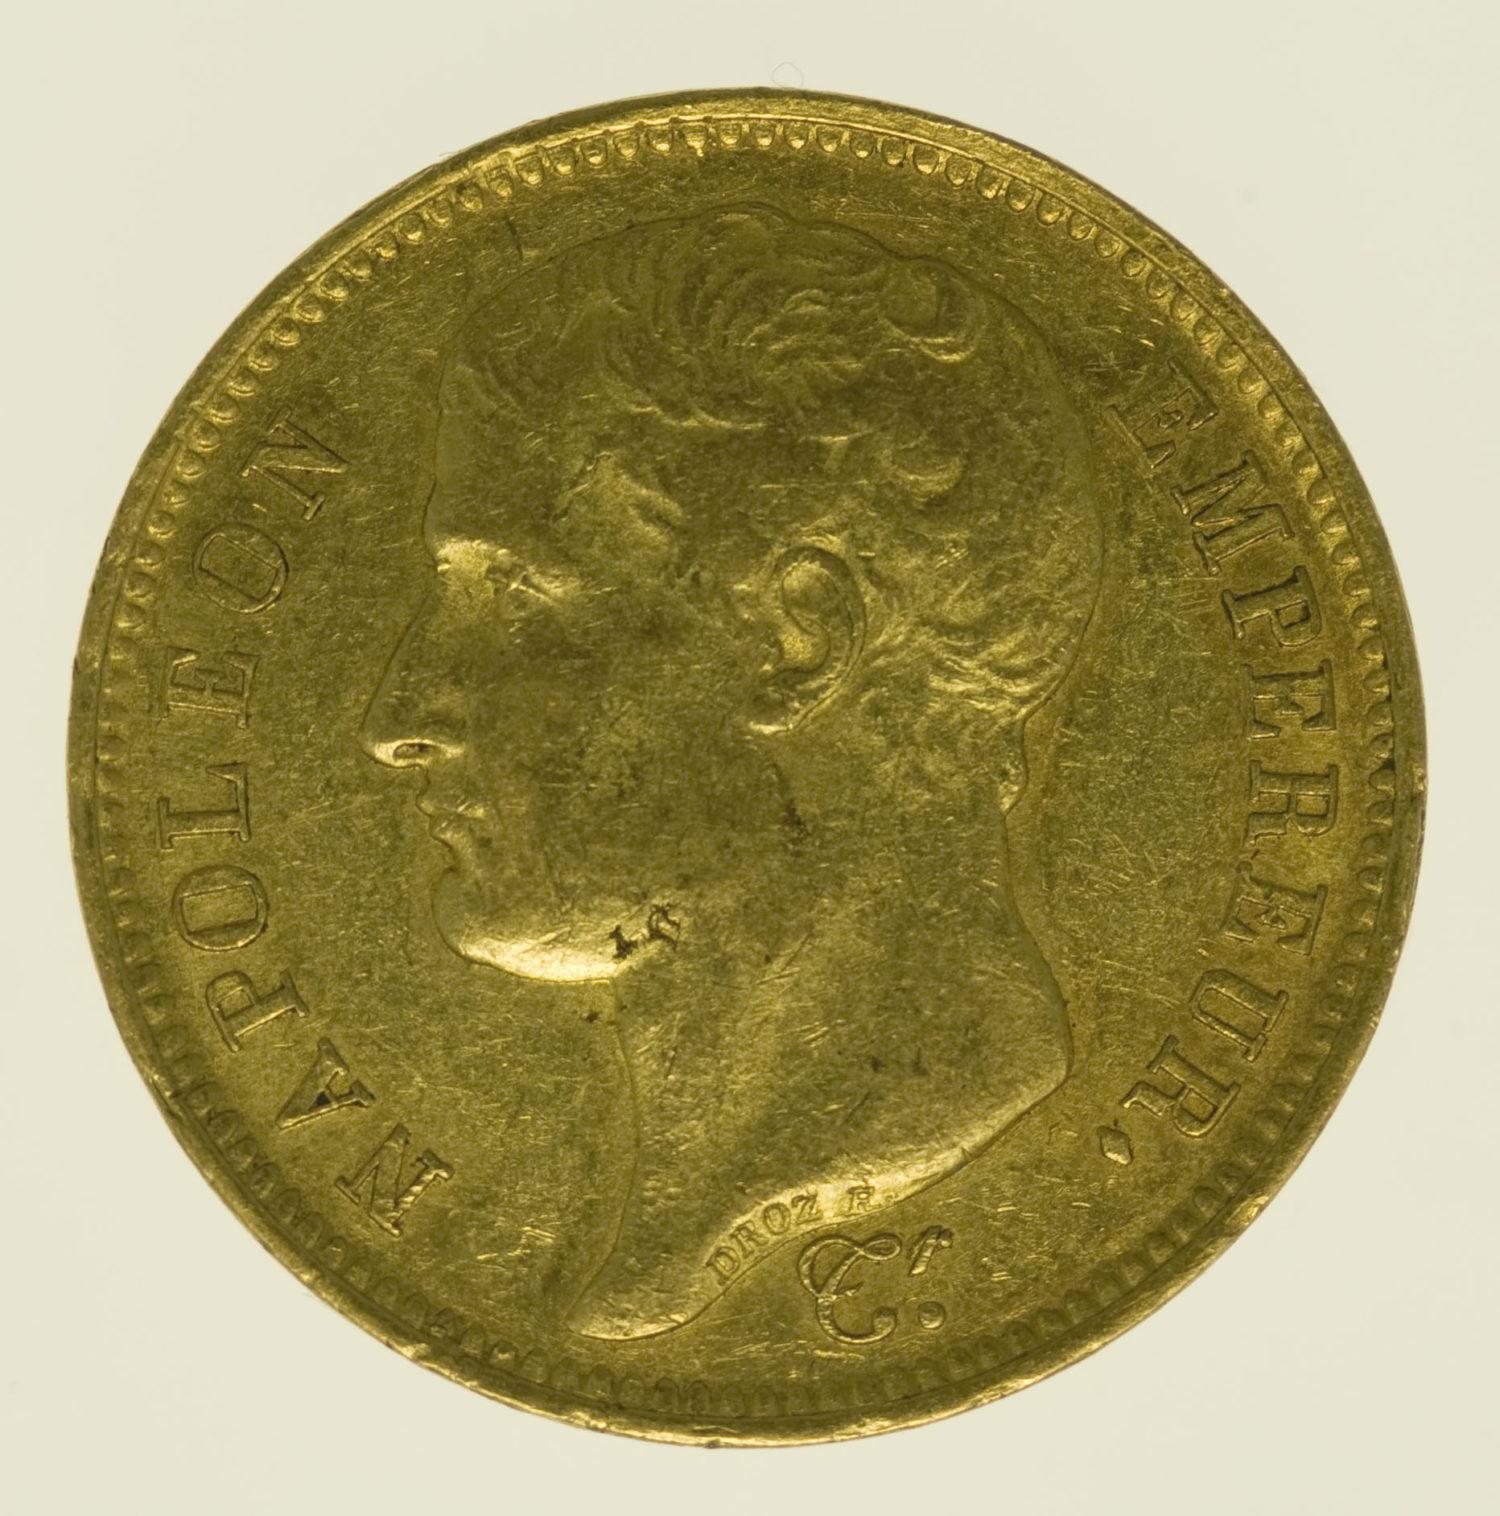 frankreich - Frankreich Napoleon I. 40 Francs 1807 M